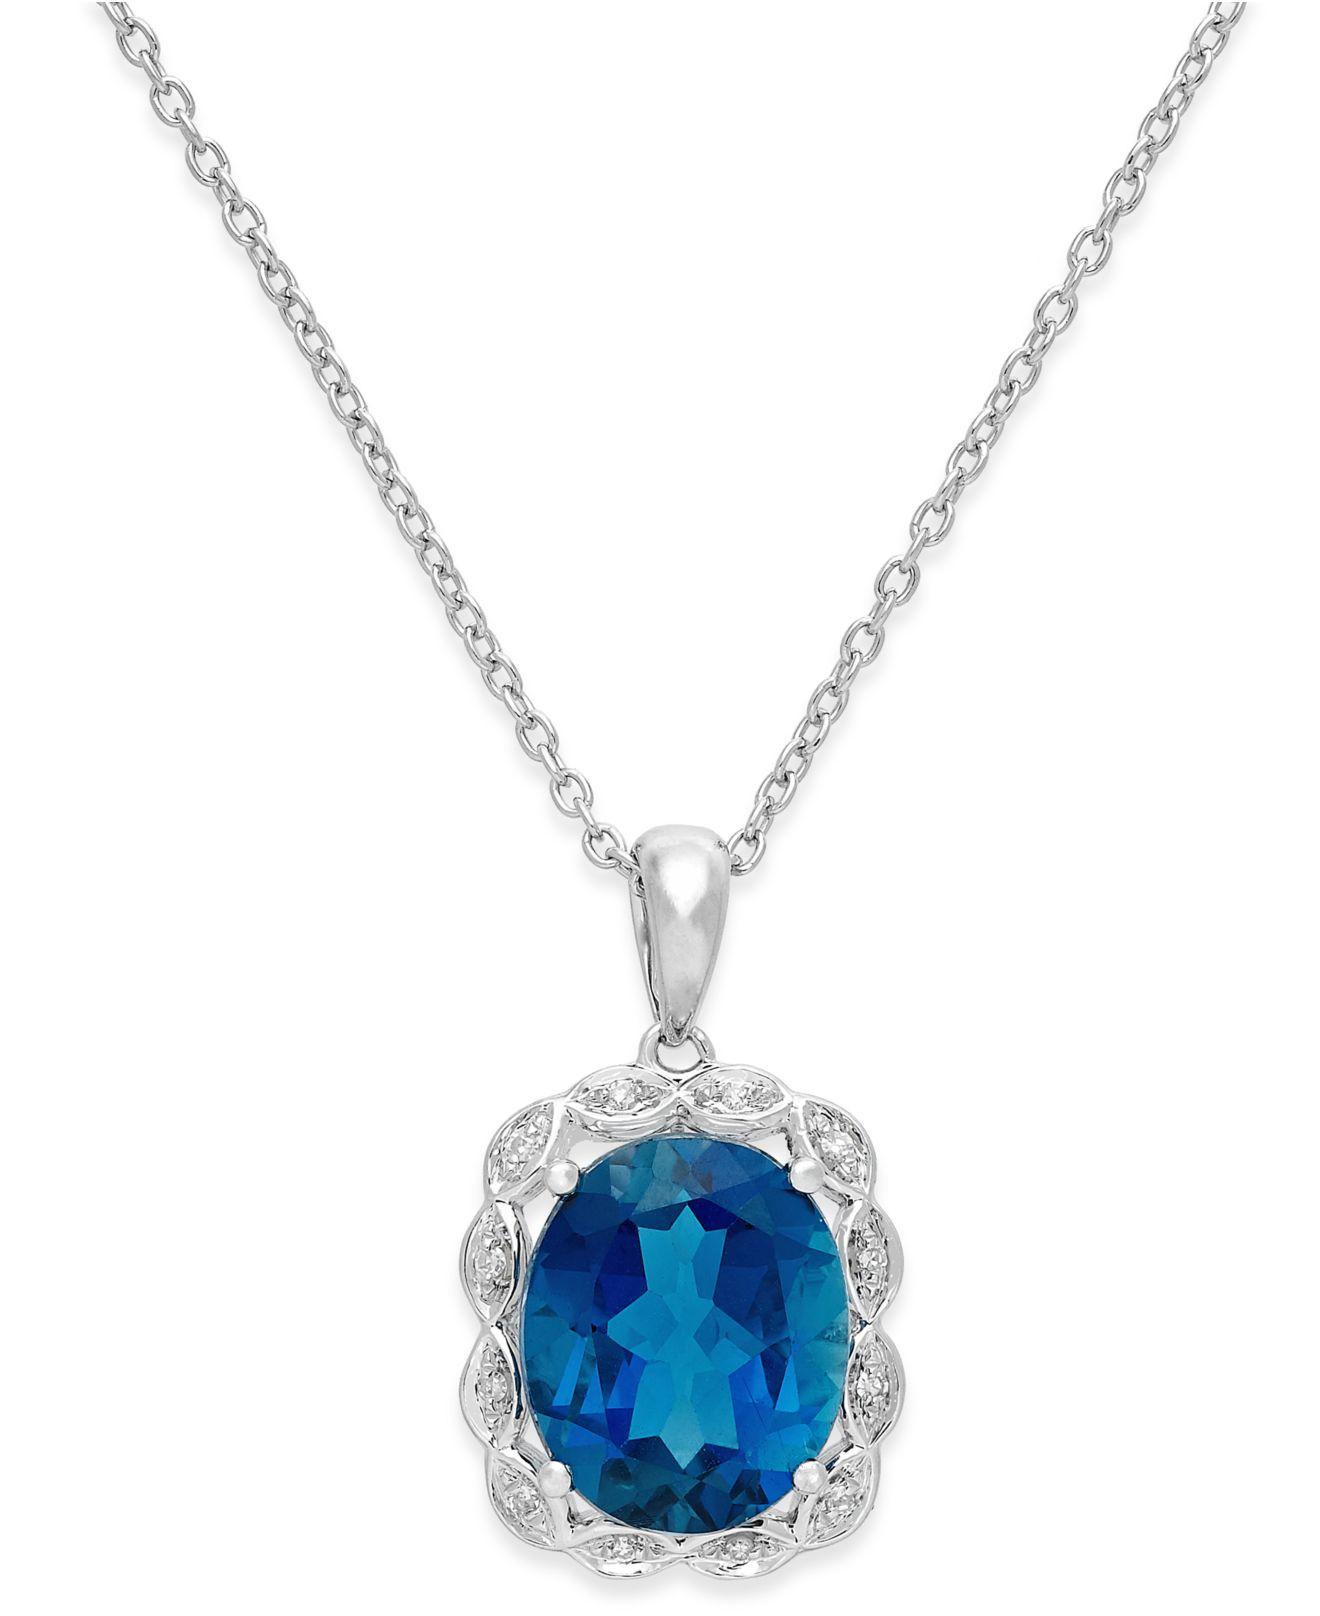 Blue London Blue Topaz Ct Tw And Diamond Accent Pendant